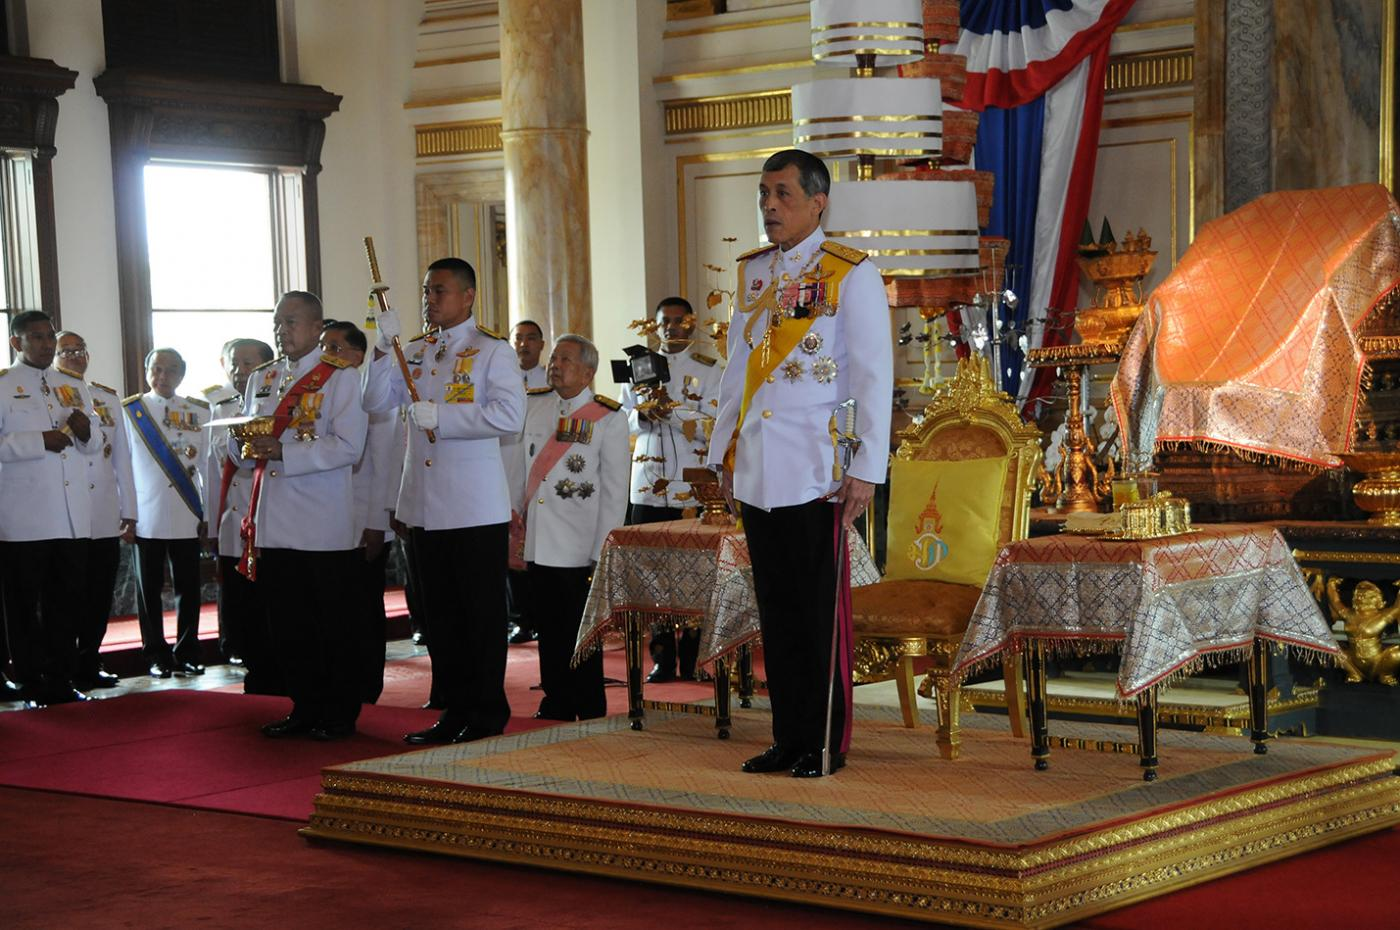 (WORLD SECTION) THAILAND-BANGKOK-INAUGURATION CEREMONY by .